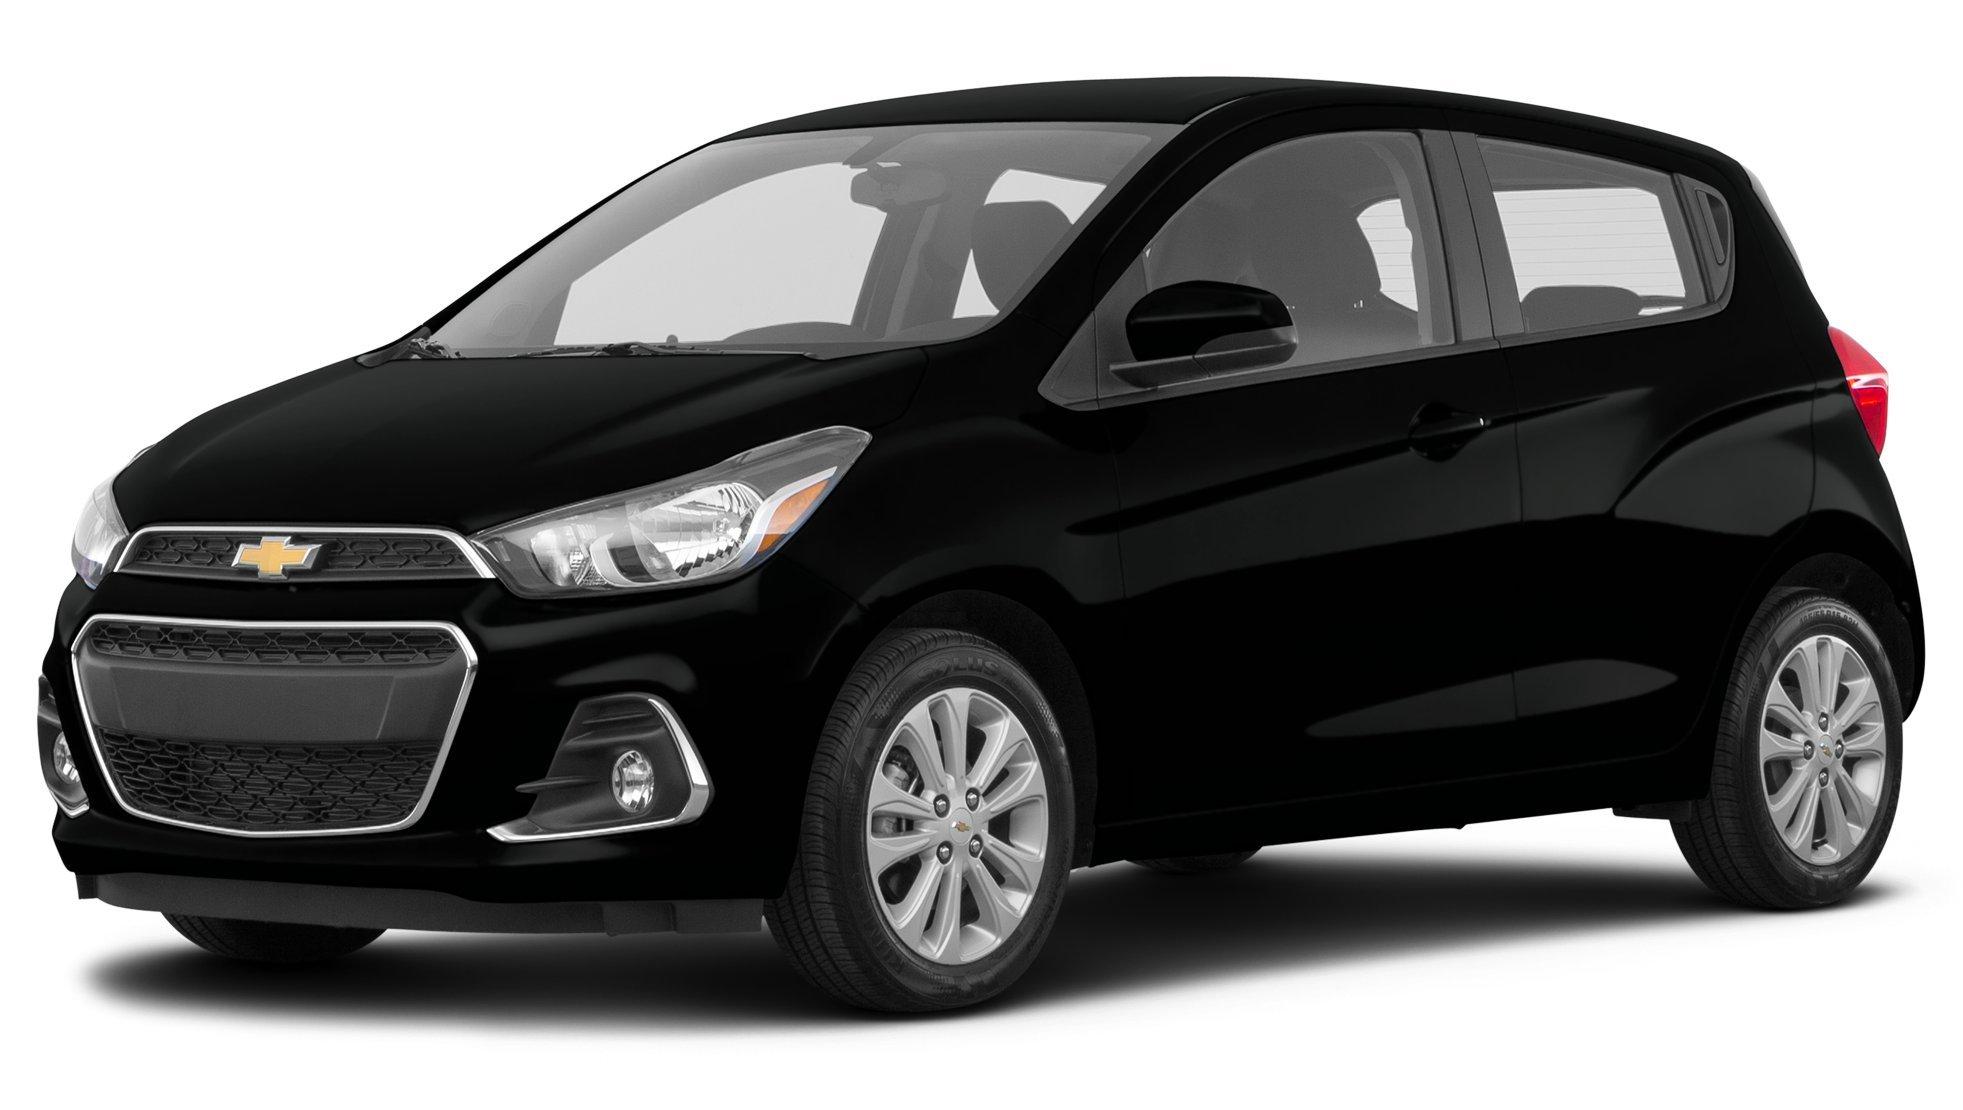 Amazon 2016 Chevrolet Spark EV Reviews and Specs Vehicles